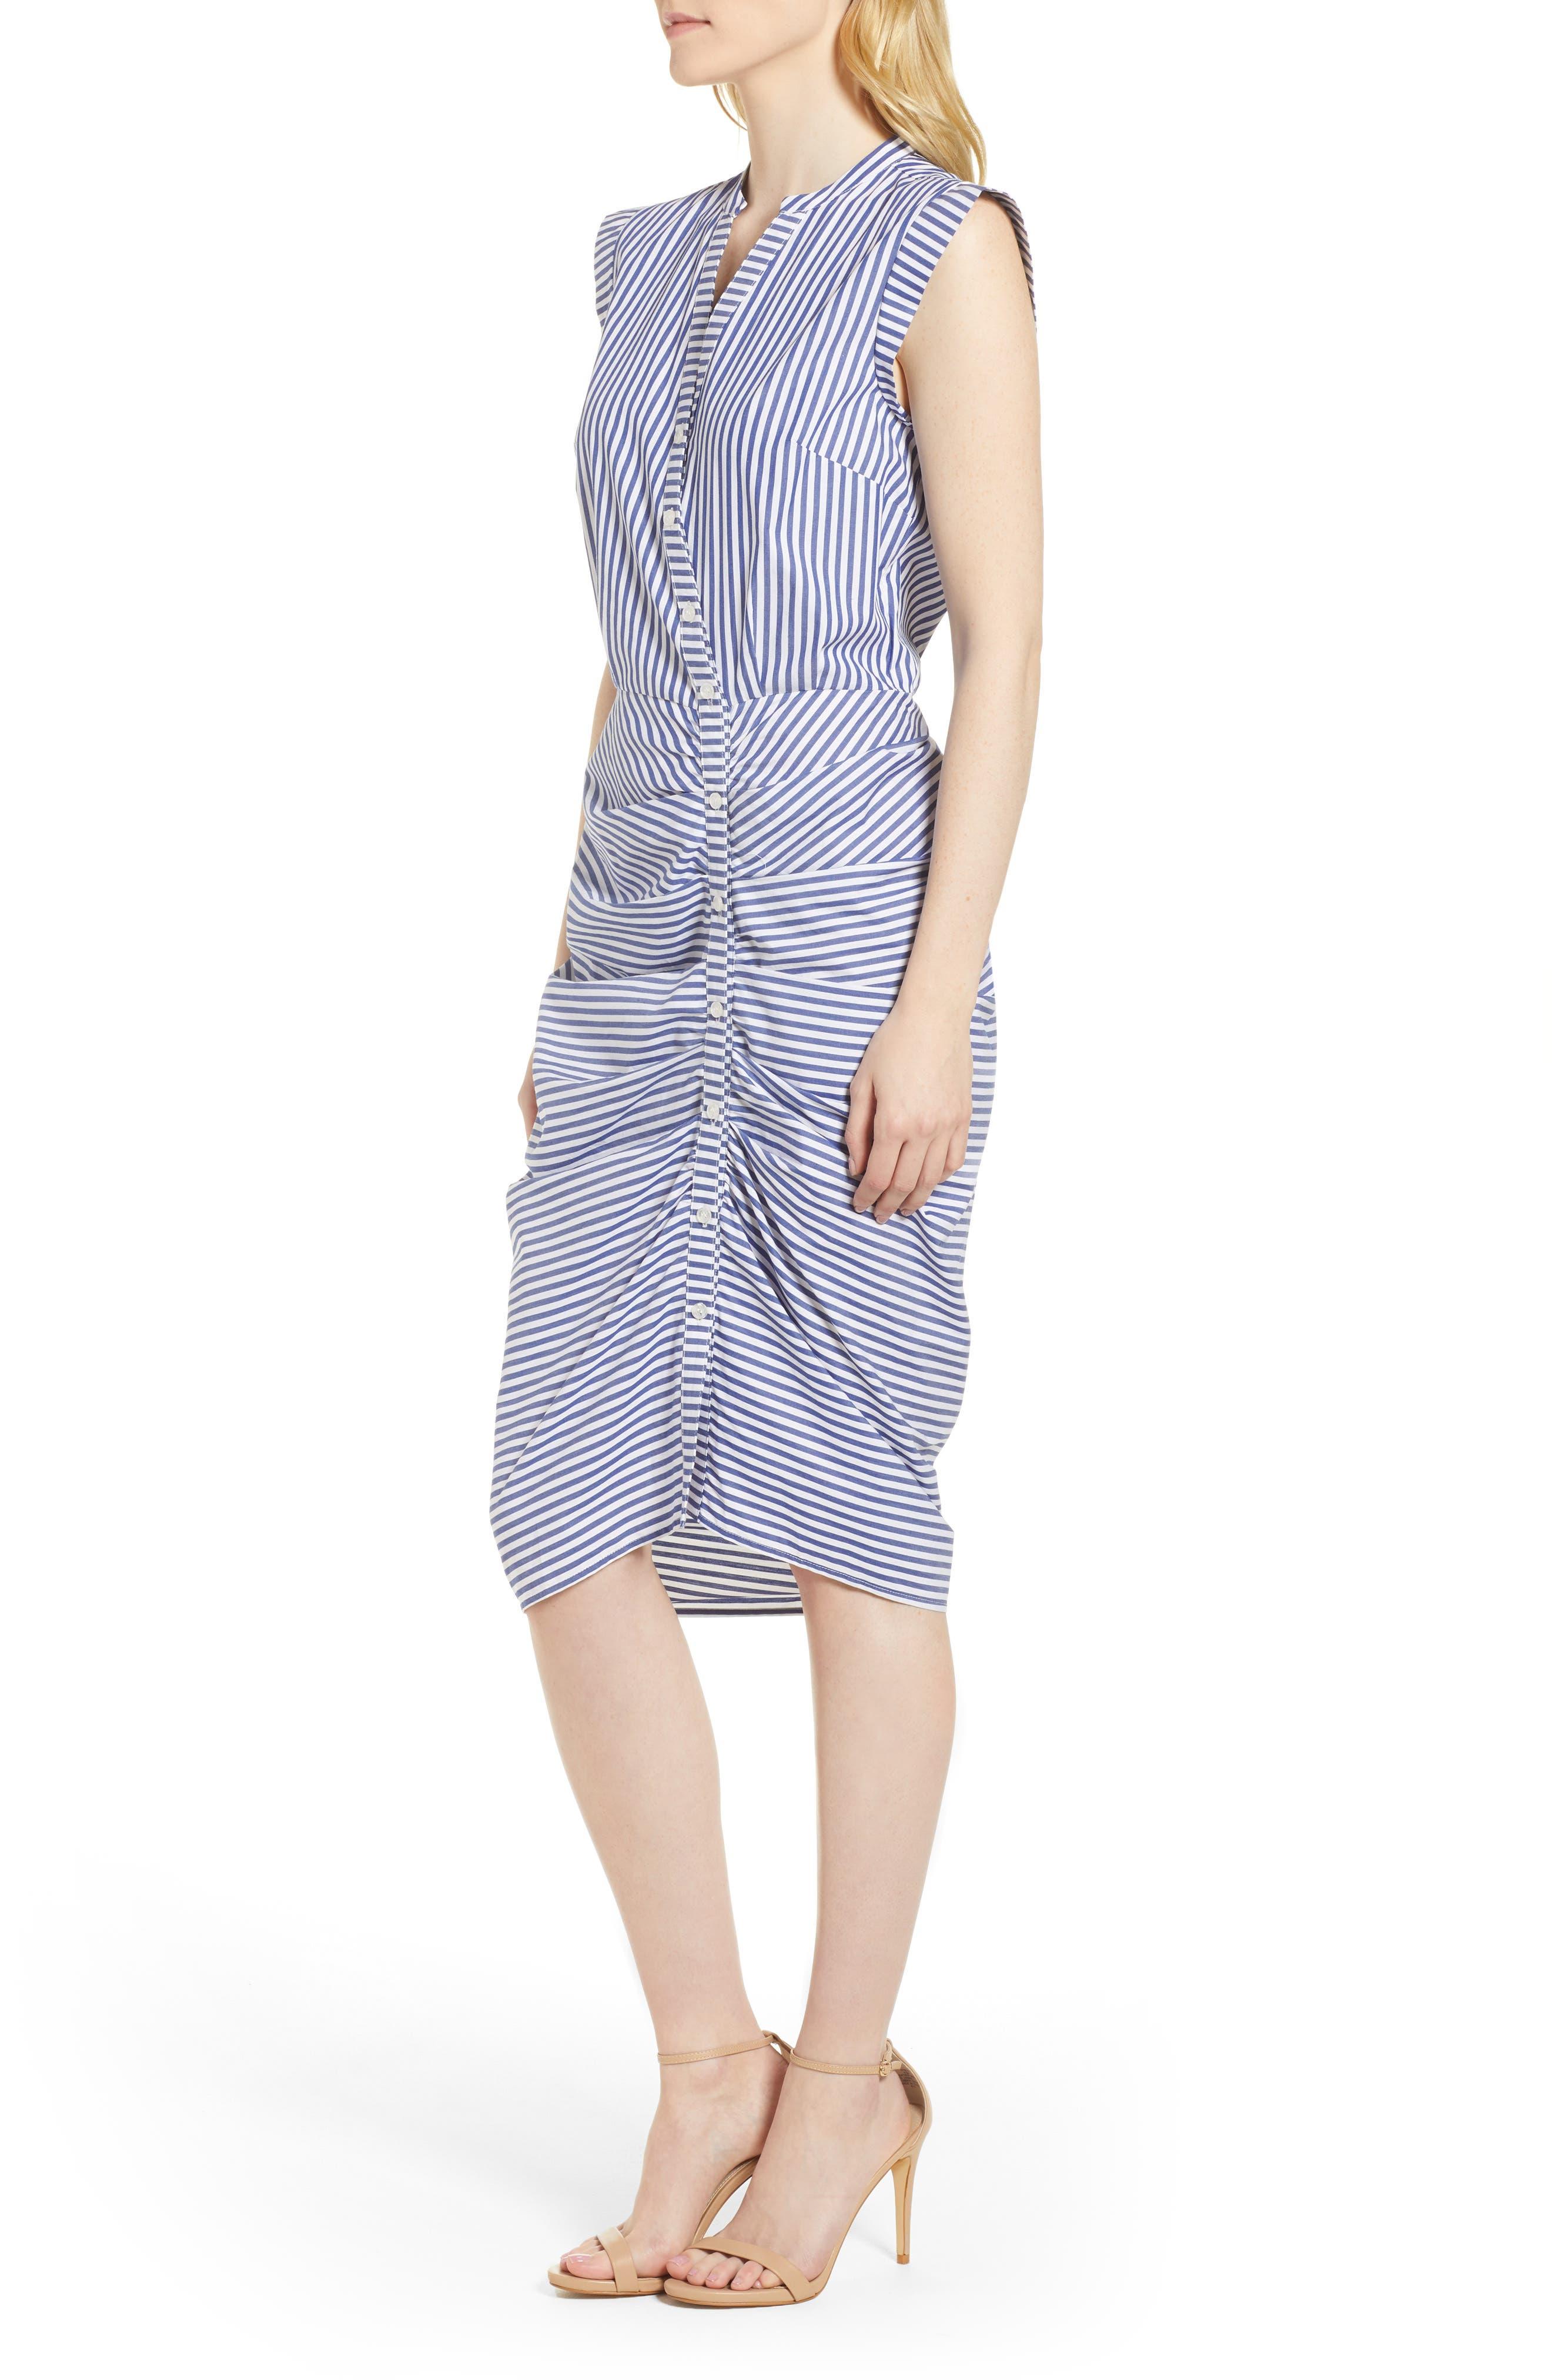 Stripe Ruched Cotton Shirtdress,                             Alternate thumbnail 10, color,                             Blue White Stripe